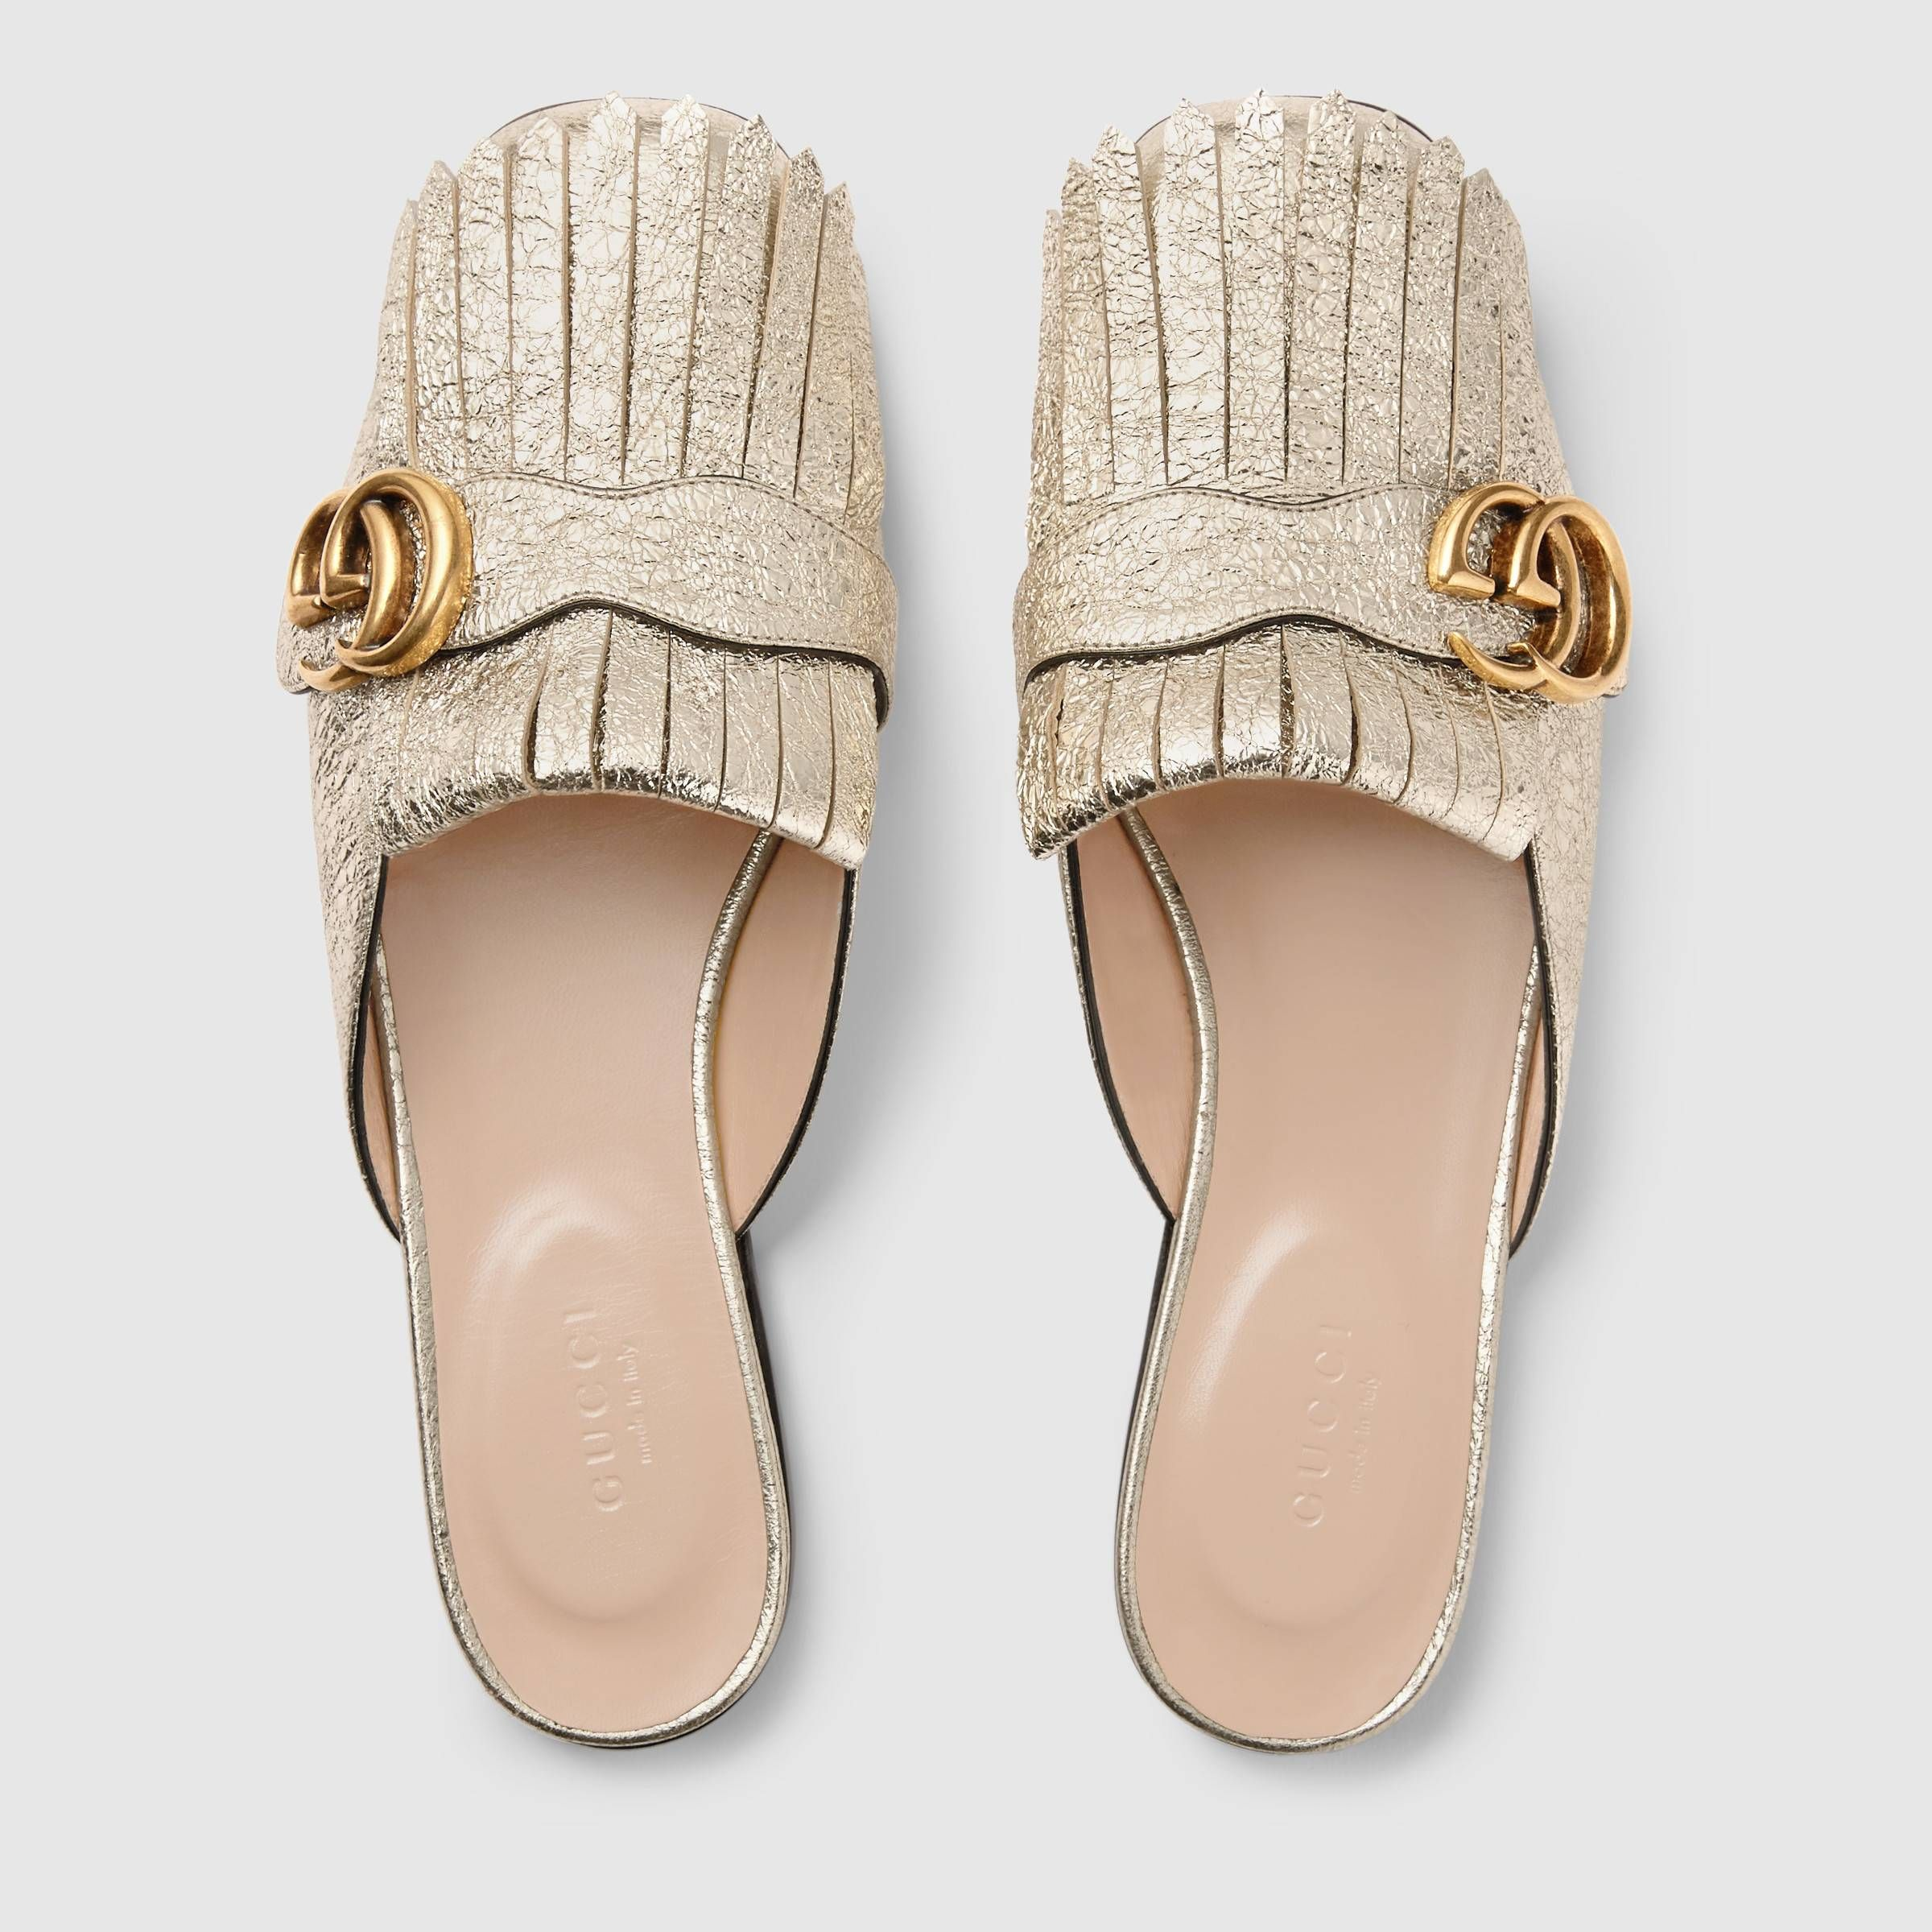 2e7e1e550 Marmont metallic laminate leather slipper - Gucci Women s Slippers   Mules  474513DKT007100